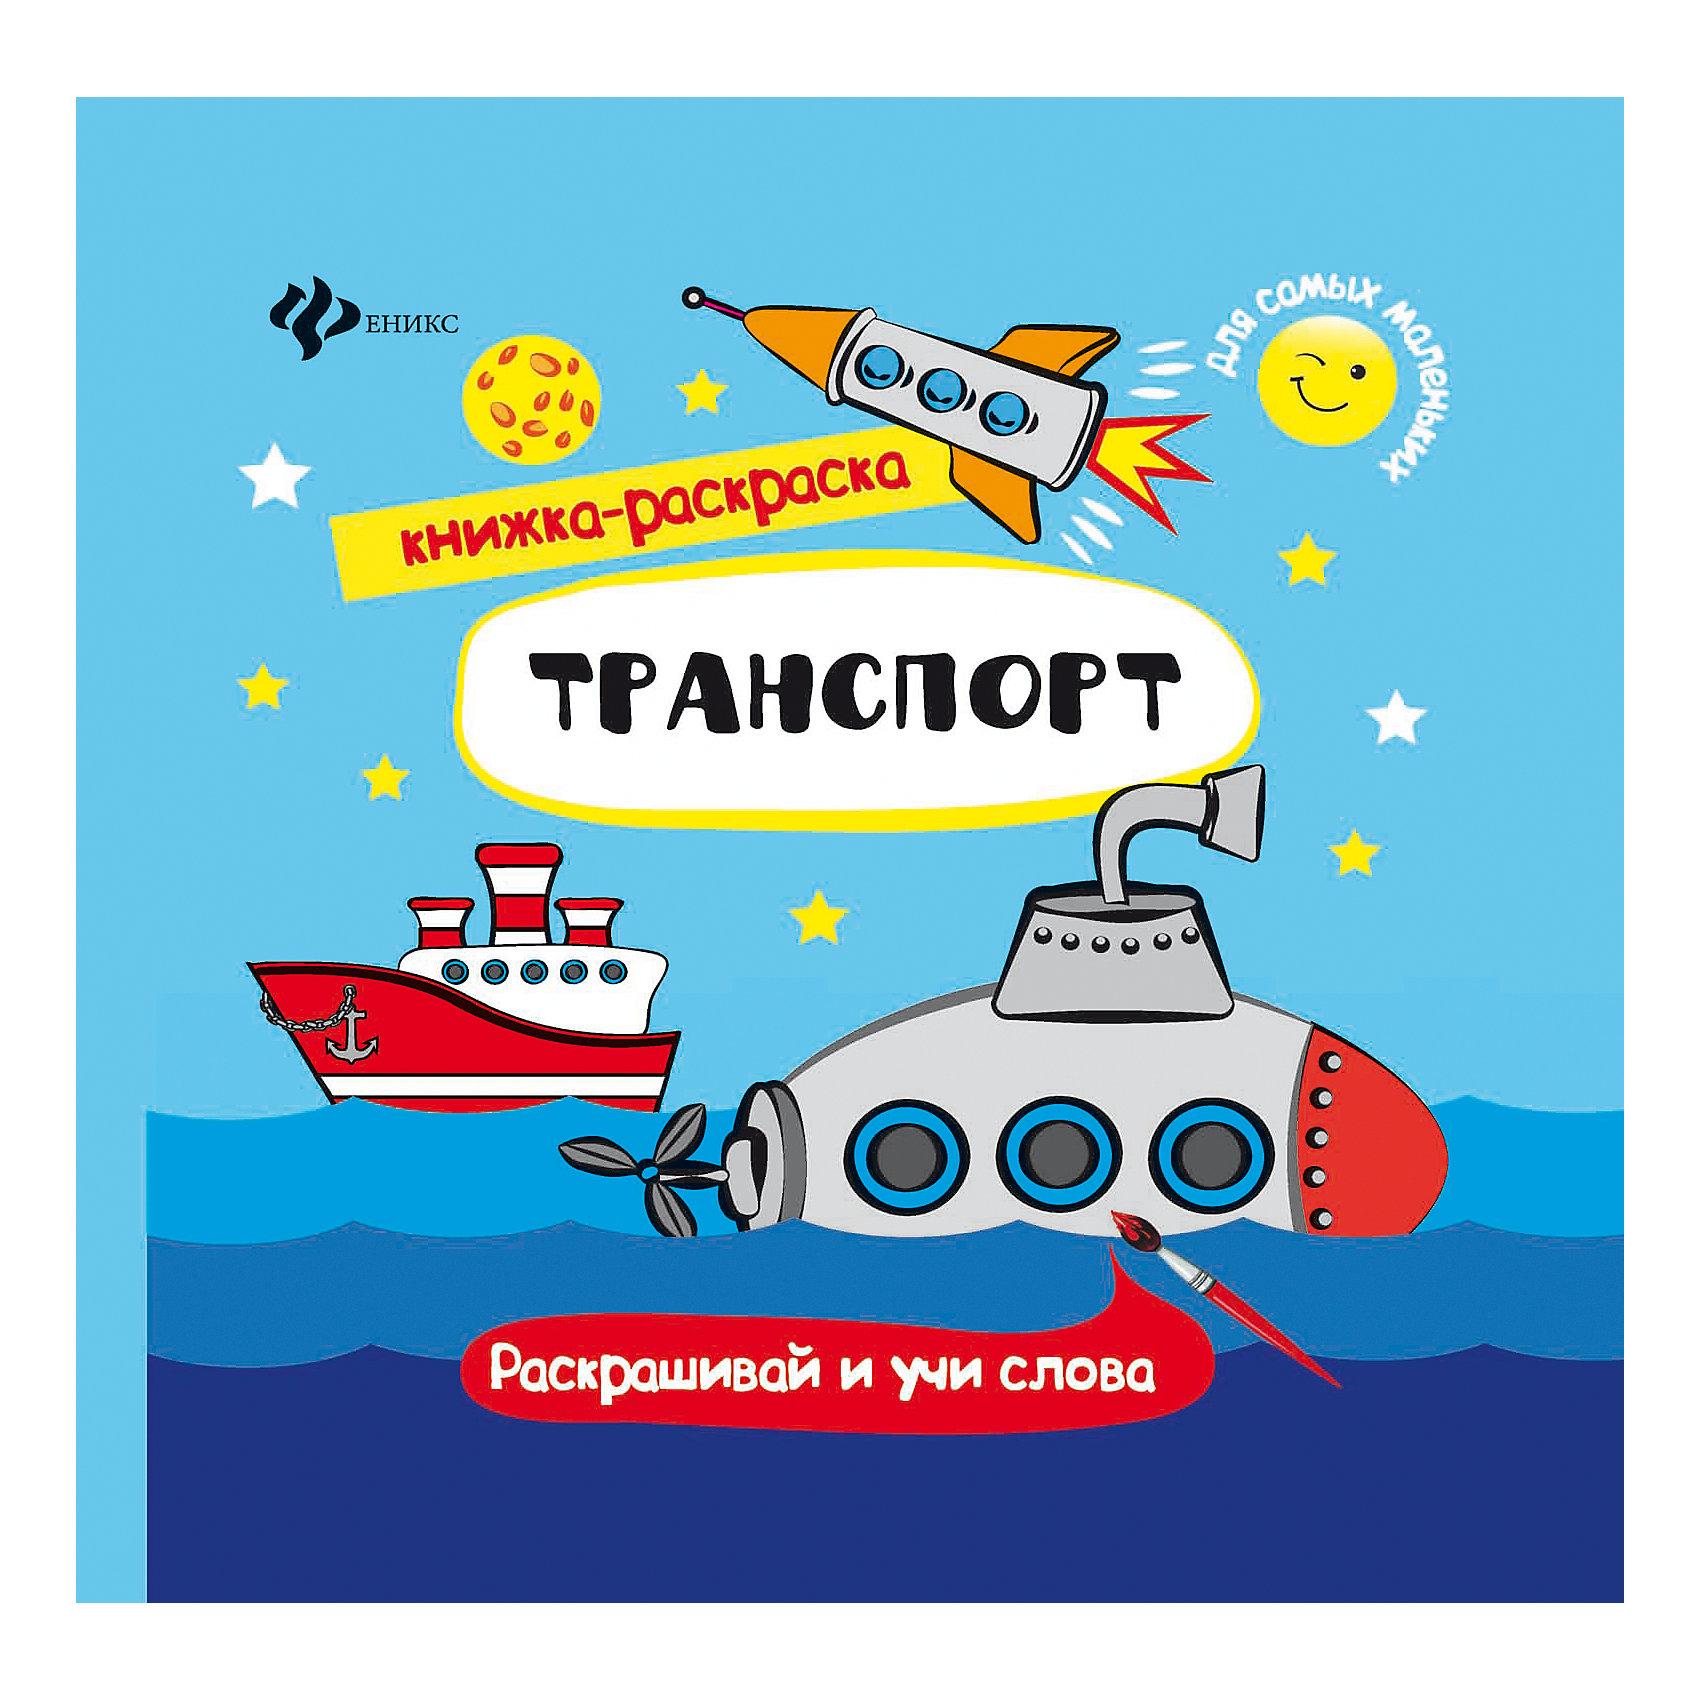 Fenix Транспорт: книжка-раскраска fenix правила безопасности дома для малышей